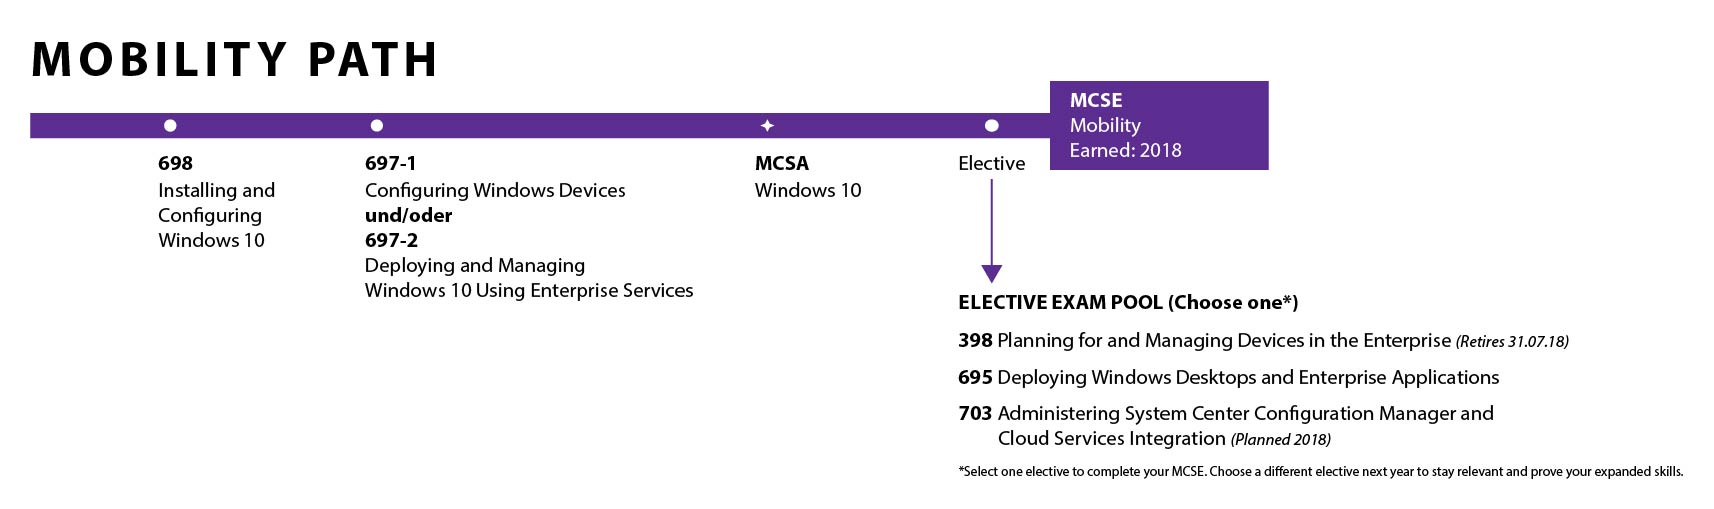 Microsoft Zertifizierungspfade